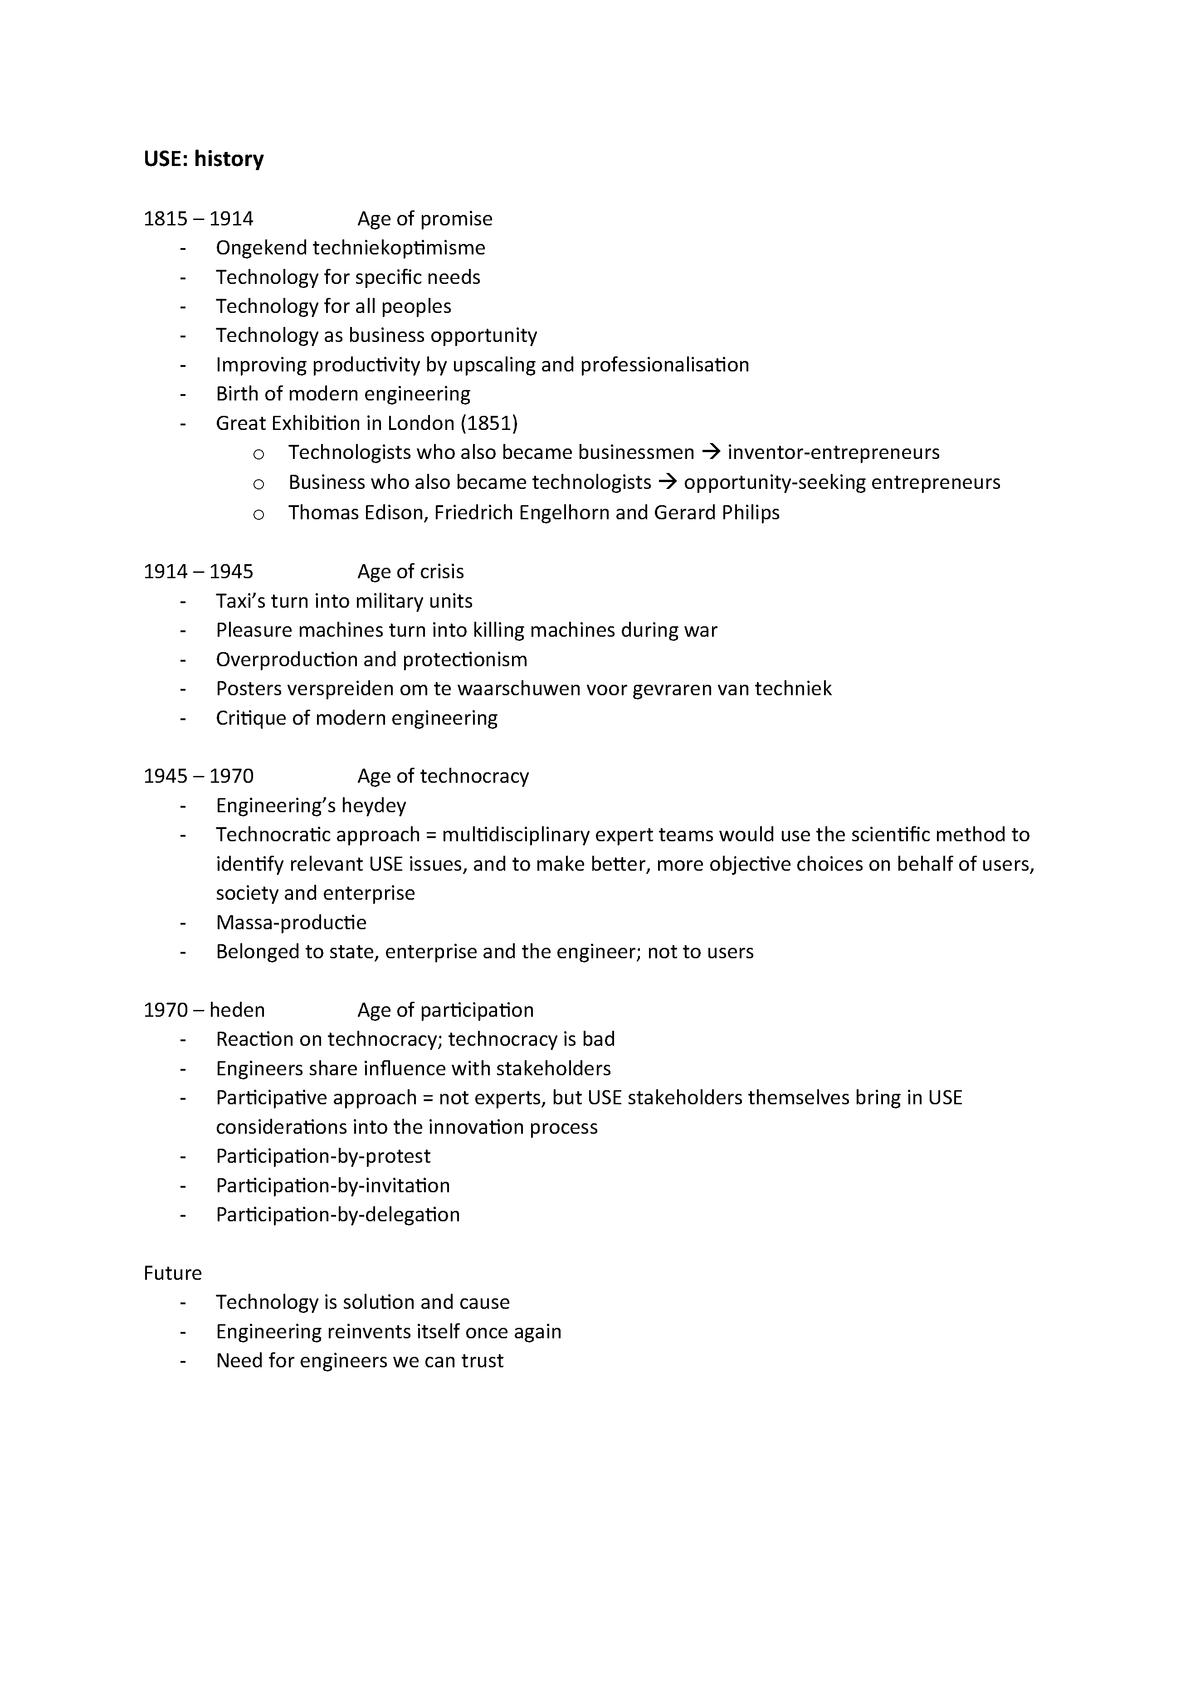 Sammanfattning 0SAB0 0SAB0 29 Dec 2018 - StuDocu